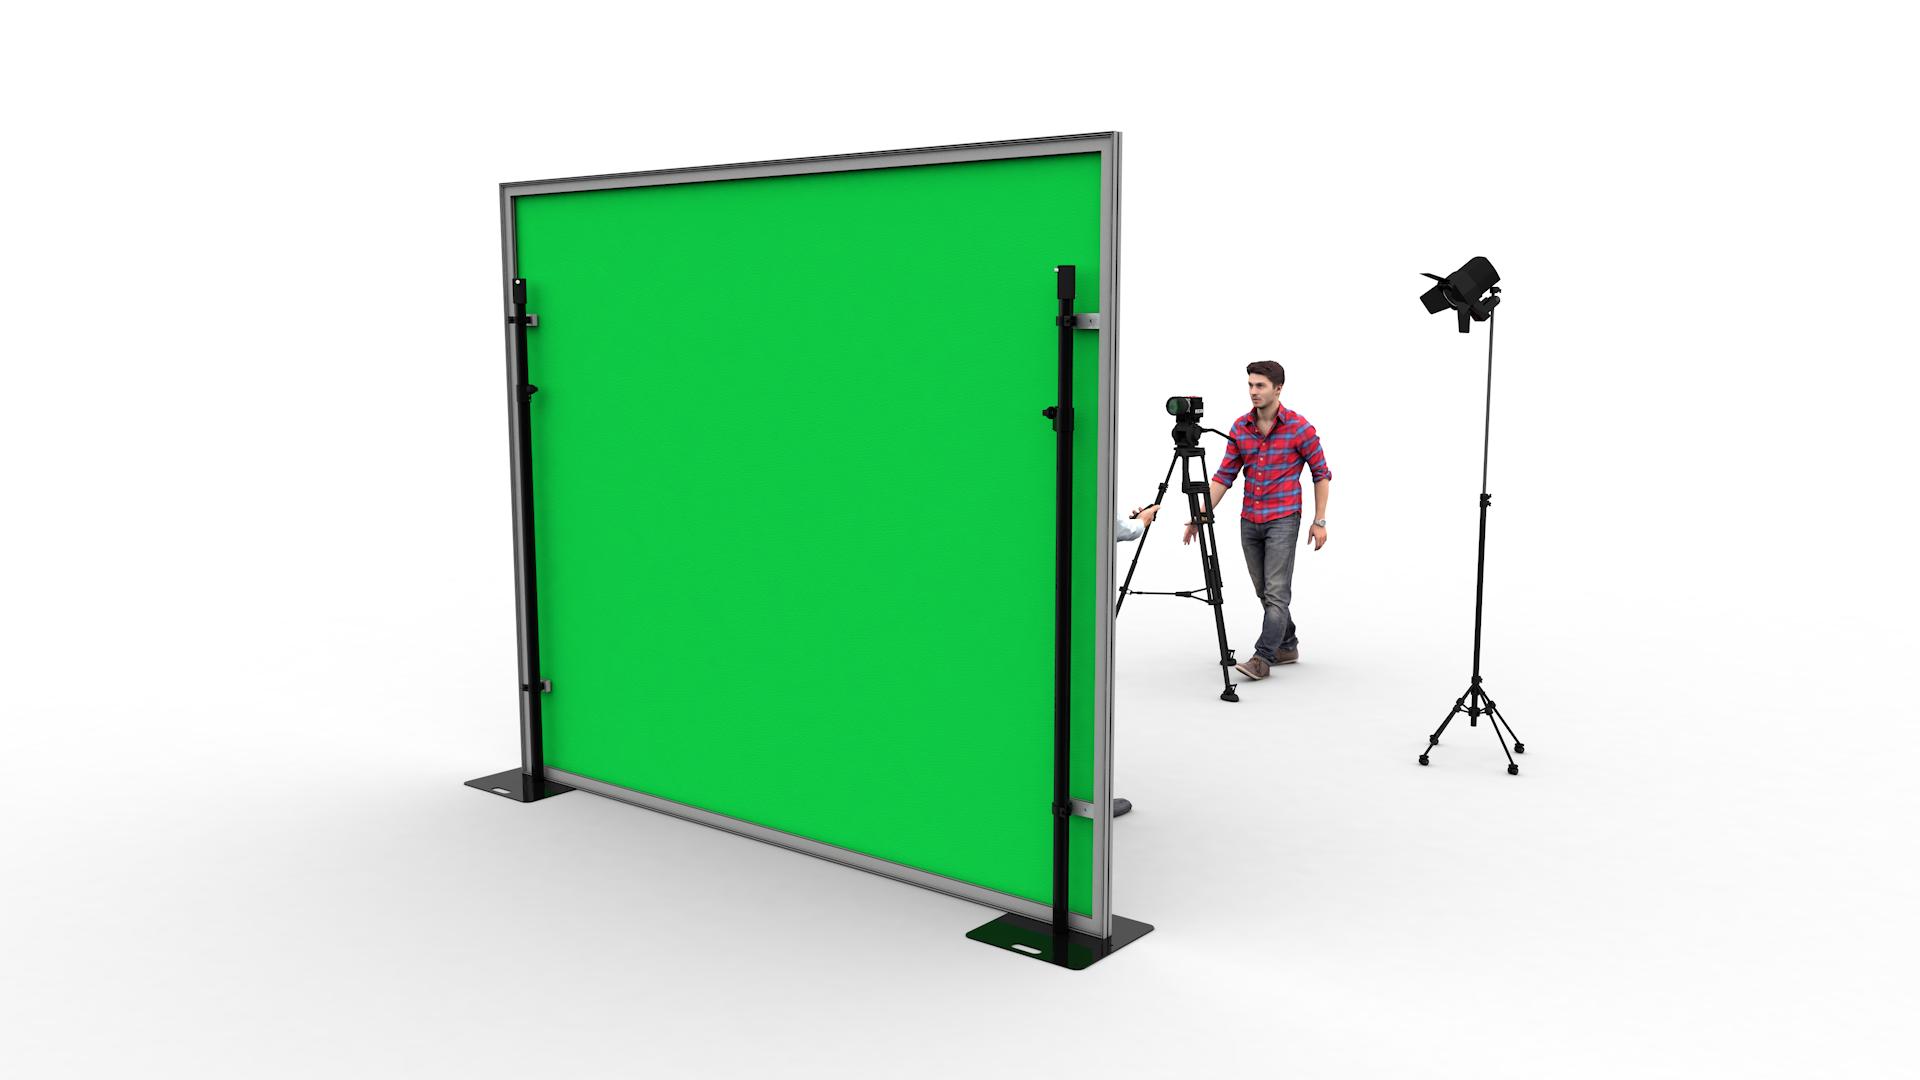 Chromakey green SET Frame